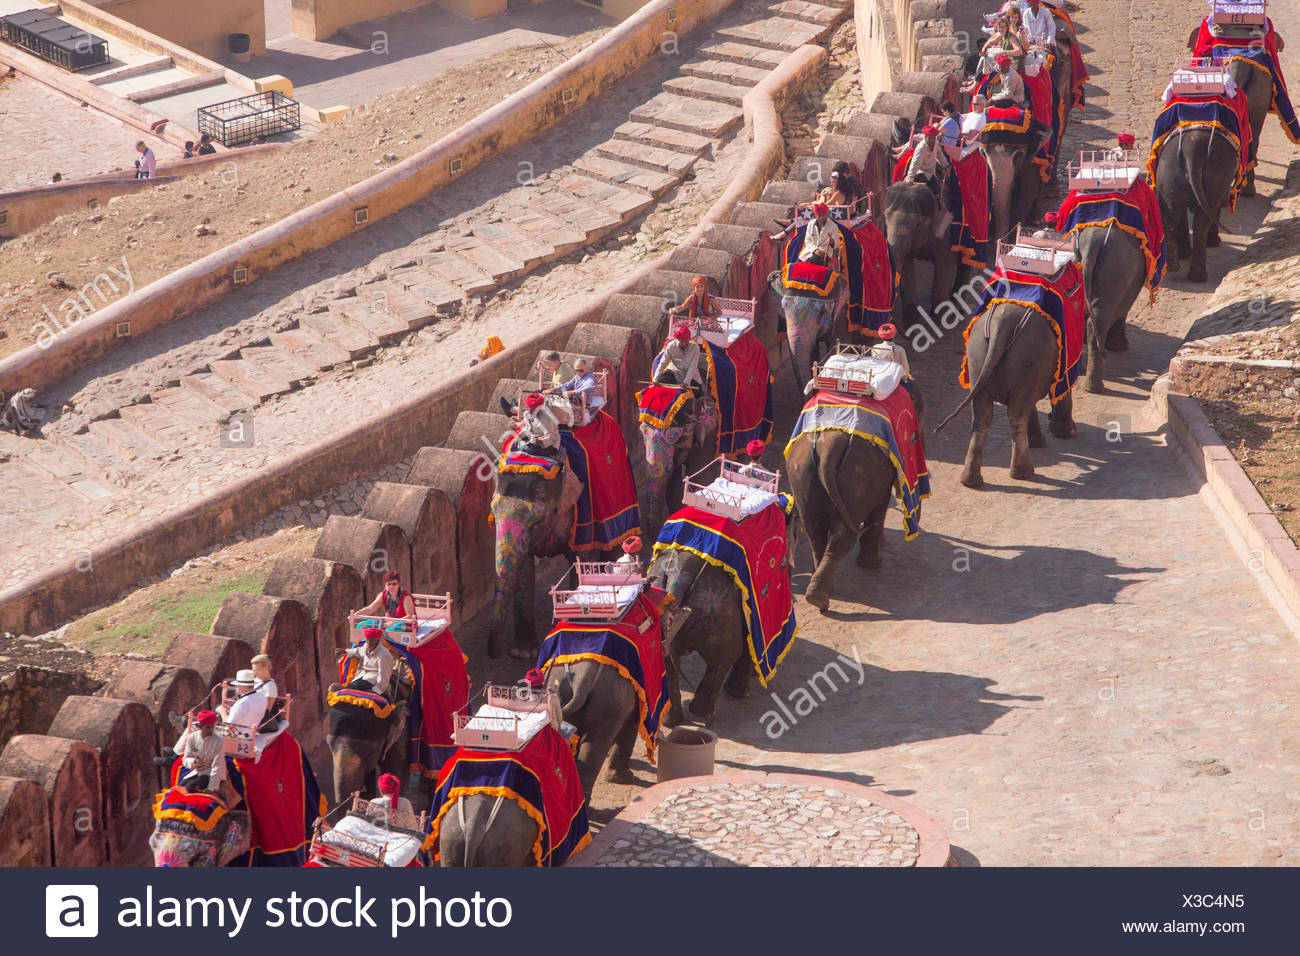 I turisti, ride, fort, ambra, elefante, Asia, India, elefante, Rajasthan, ambra, Jaipur, Immagini Stock